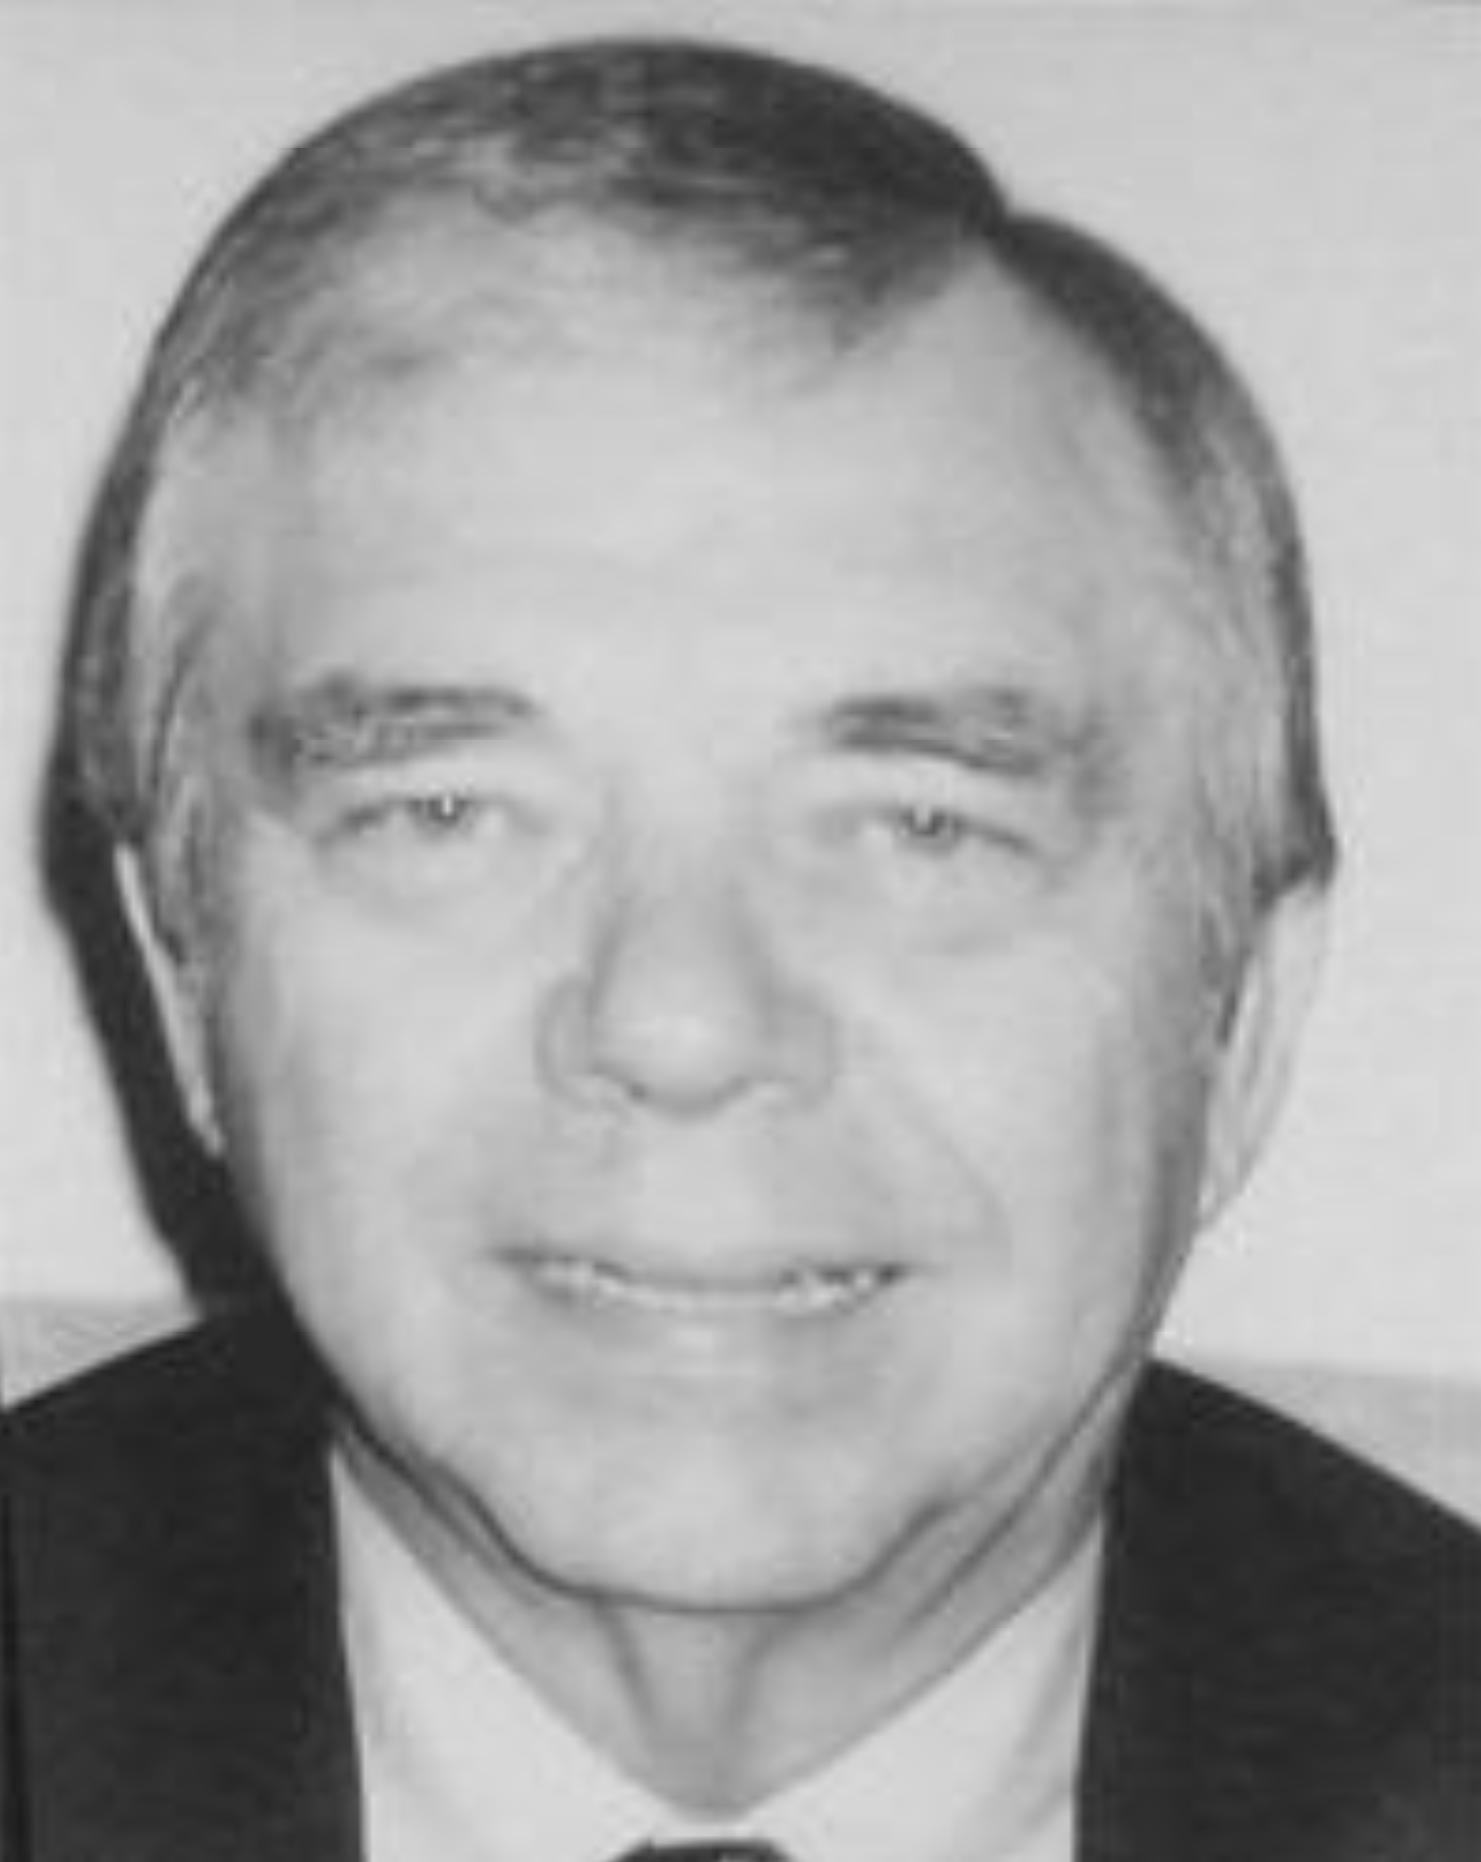 WILBUR C. BRADLEY